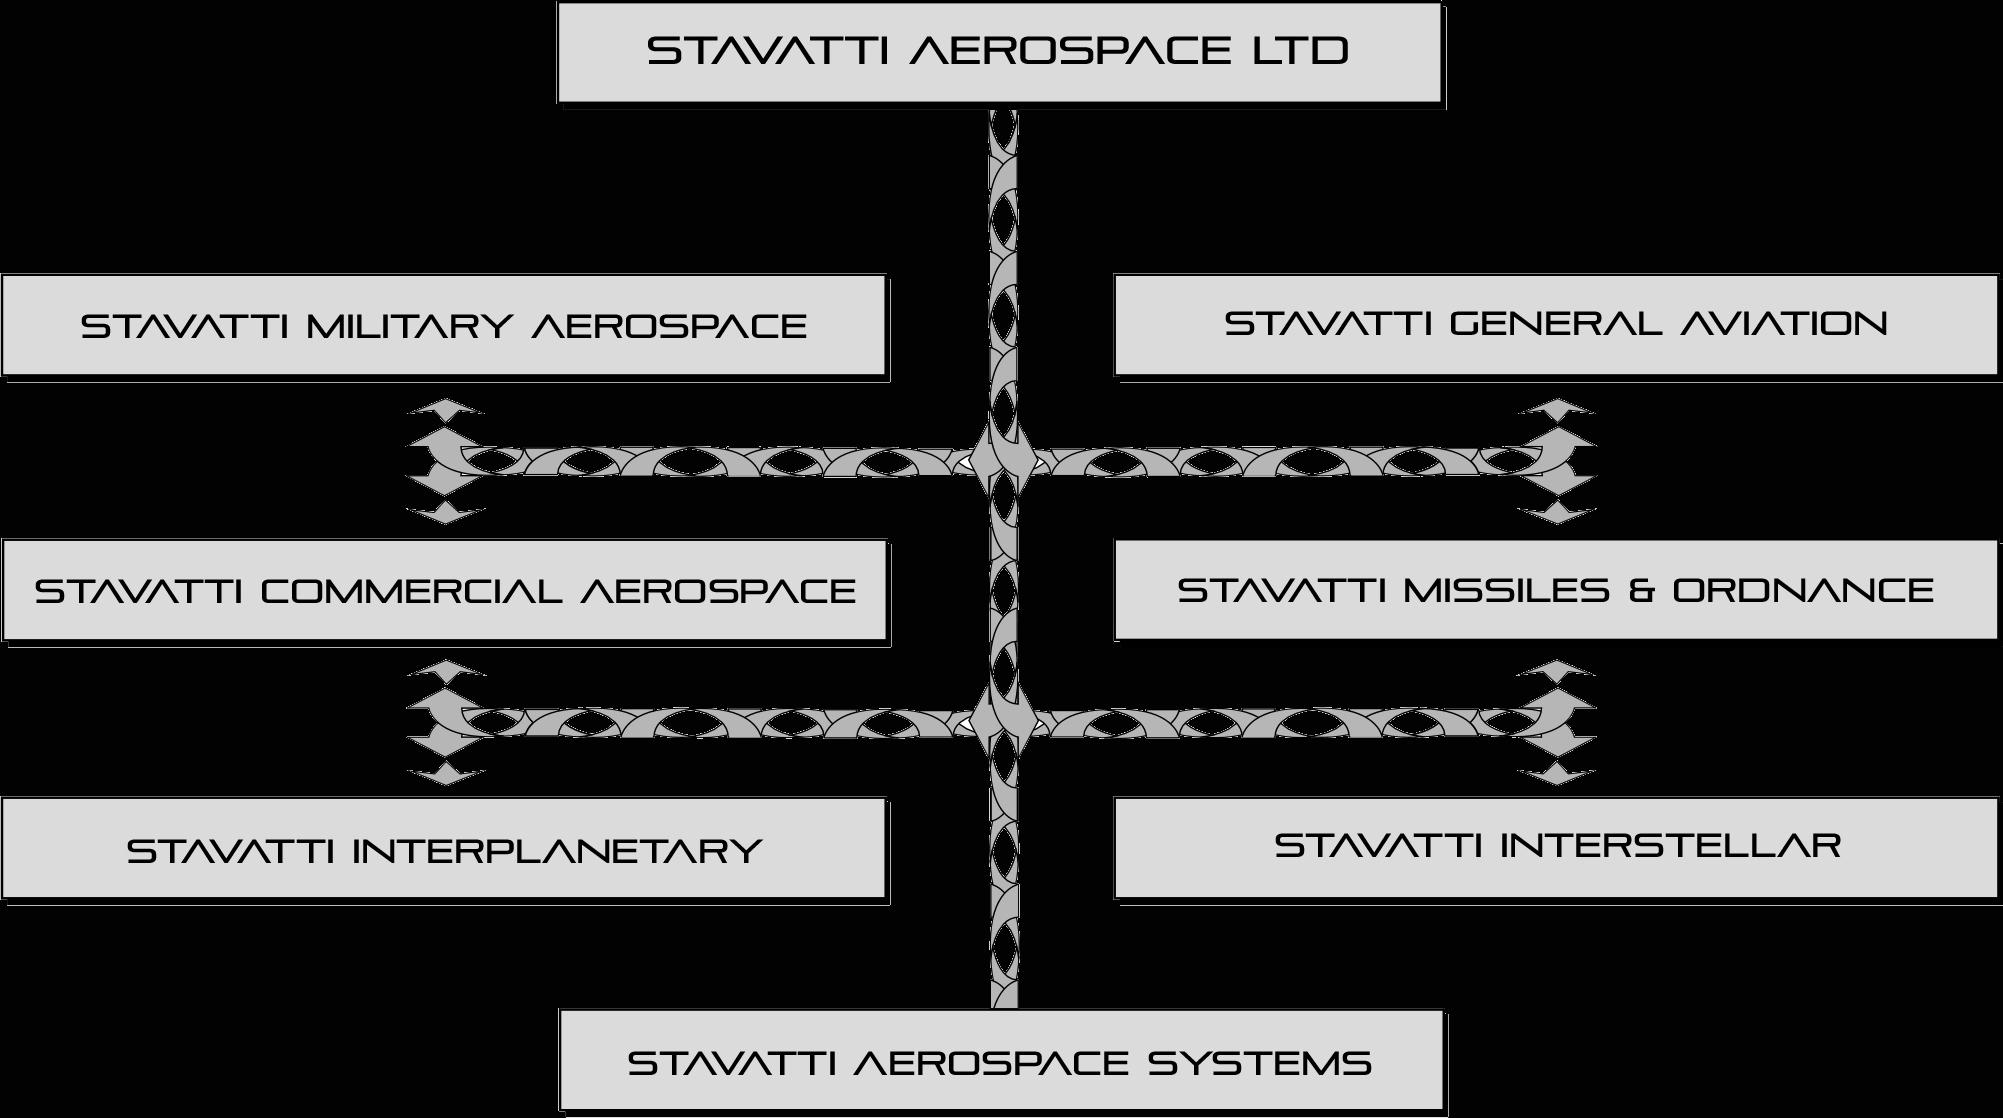 stavatti-aerospace